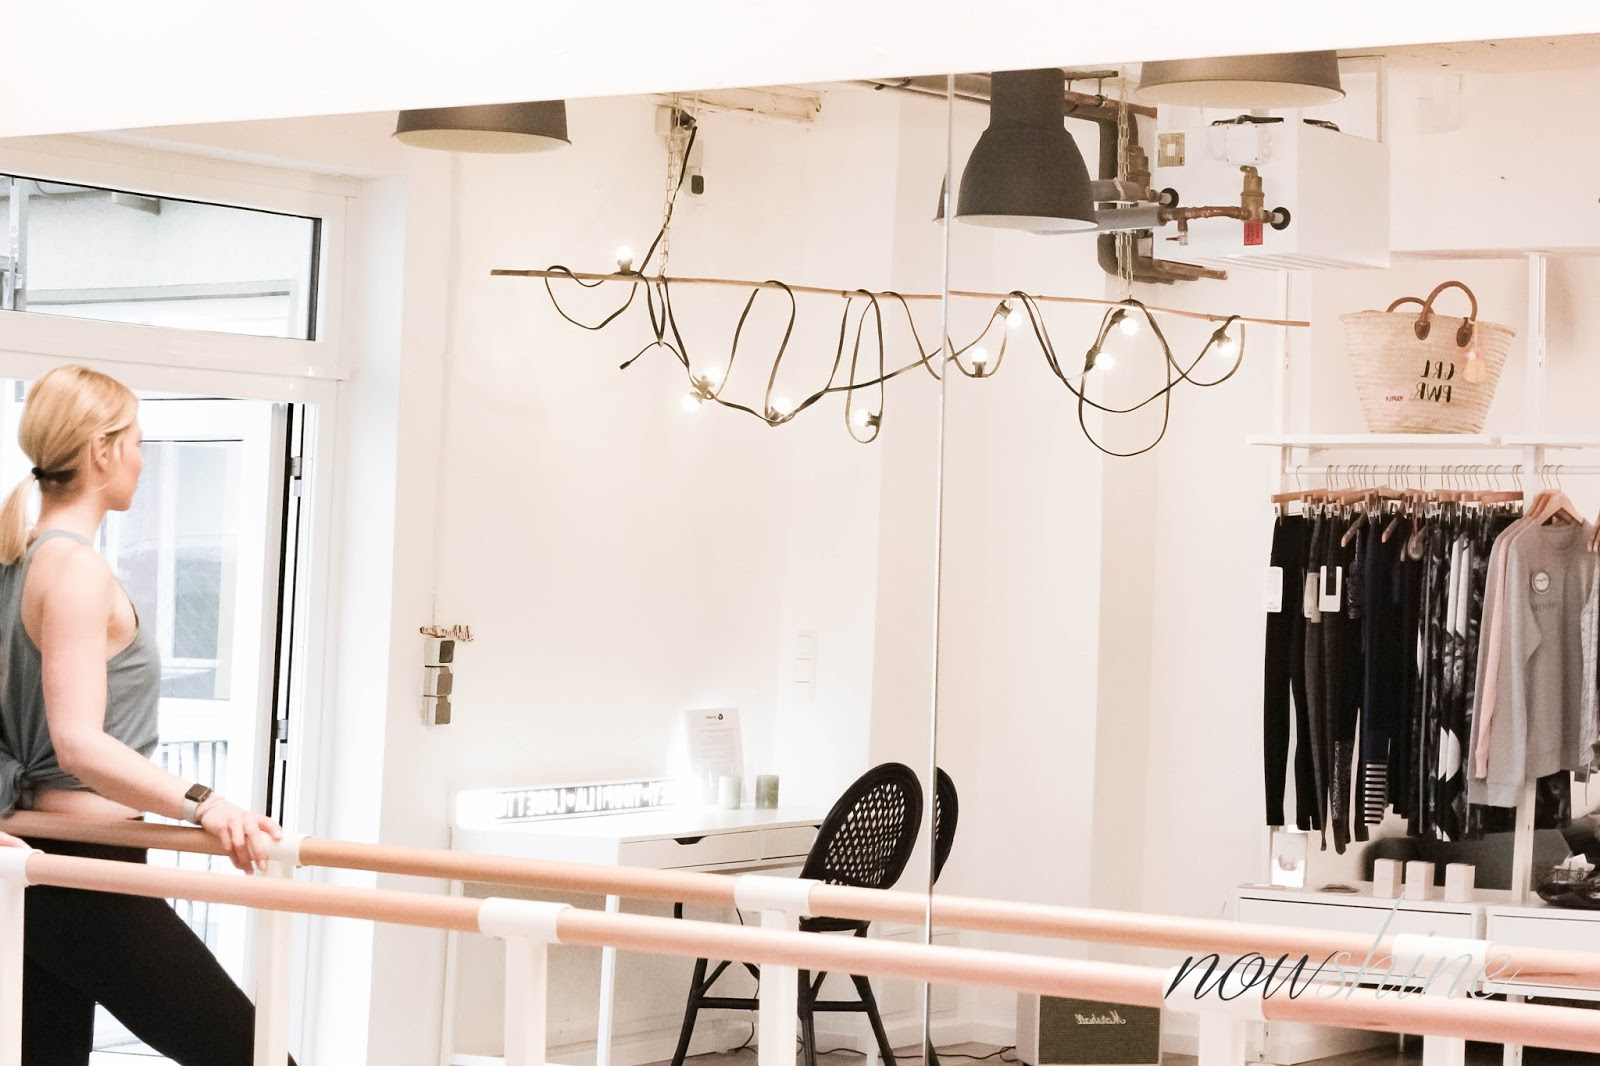 Ballett Barre Workout bei Youpila in Düsseldorf- Fitnessblog über 40